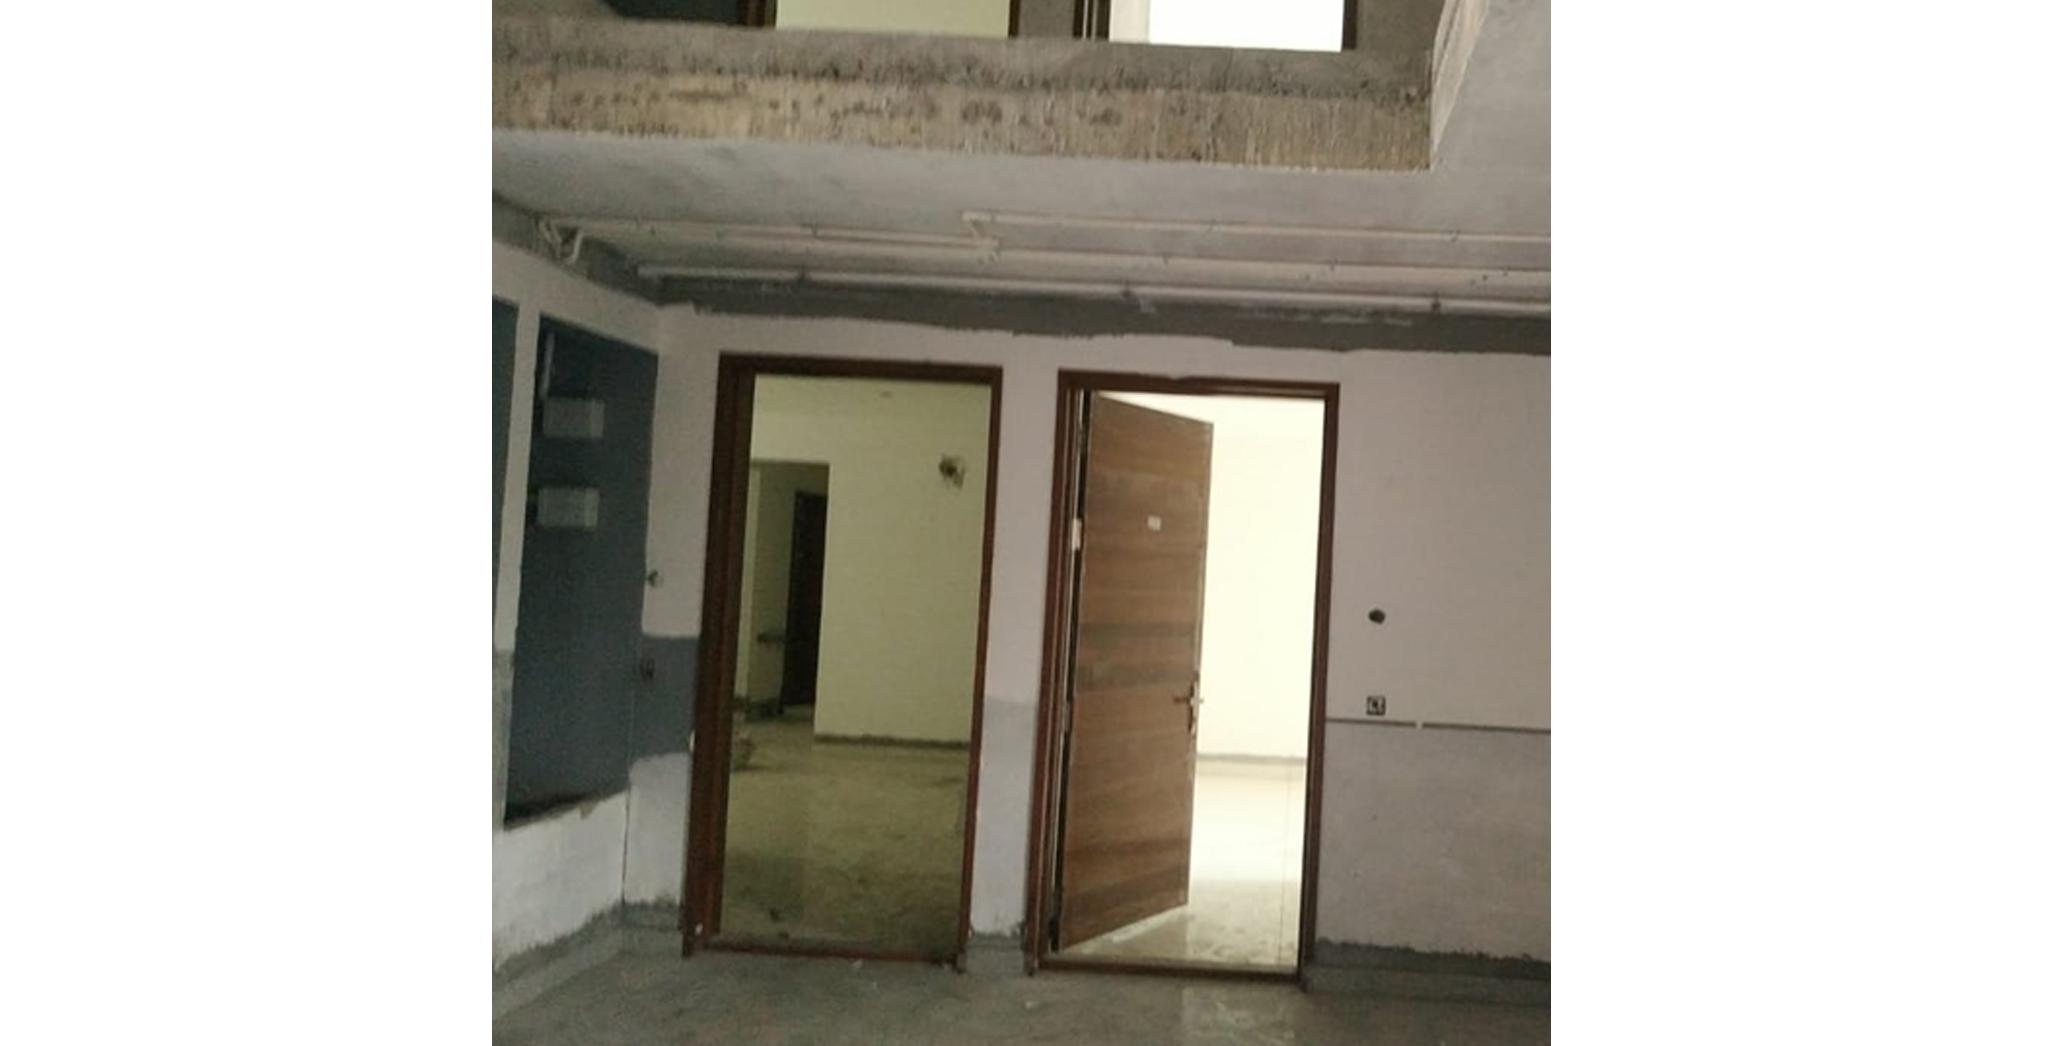 Aug 2021 - L Block: Ground floor lobby finishes work in progress